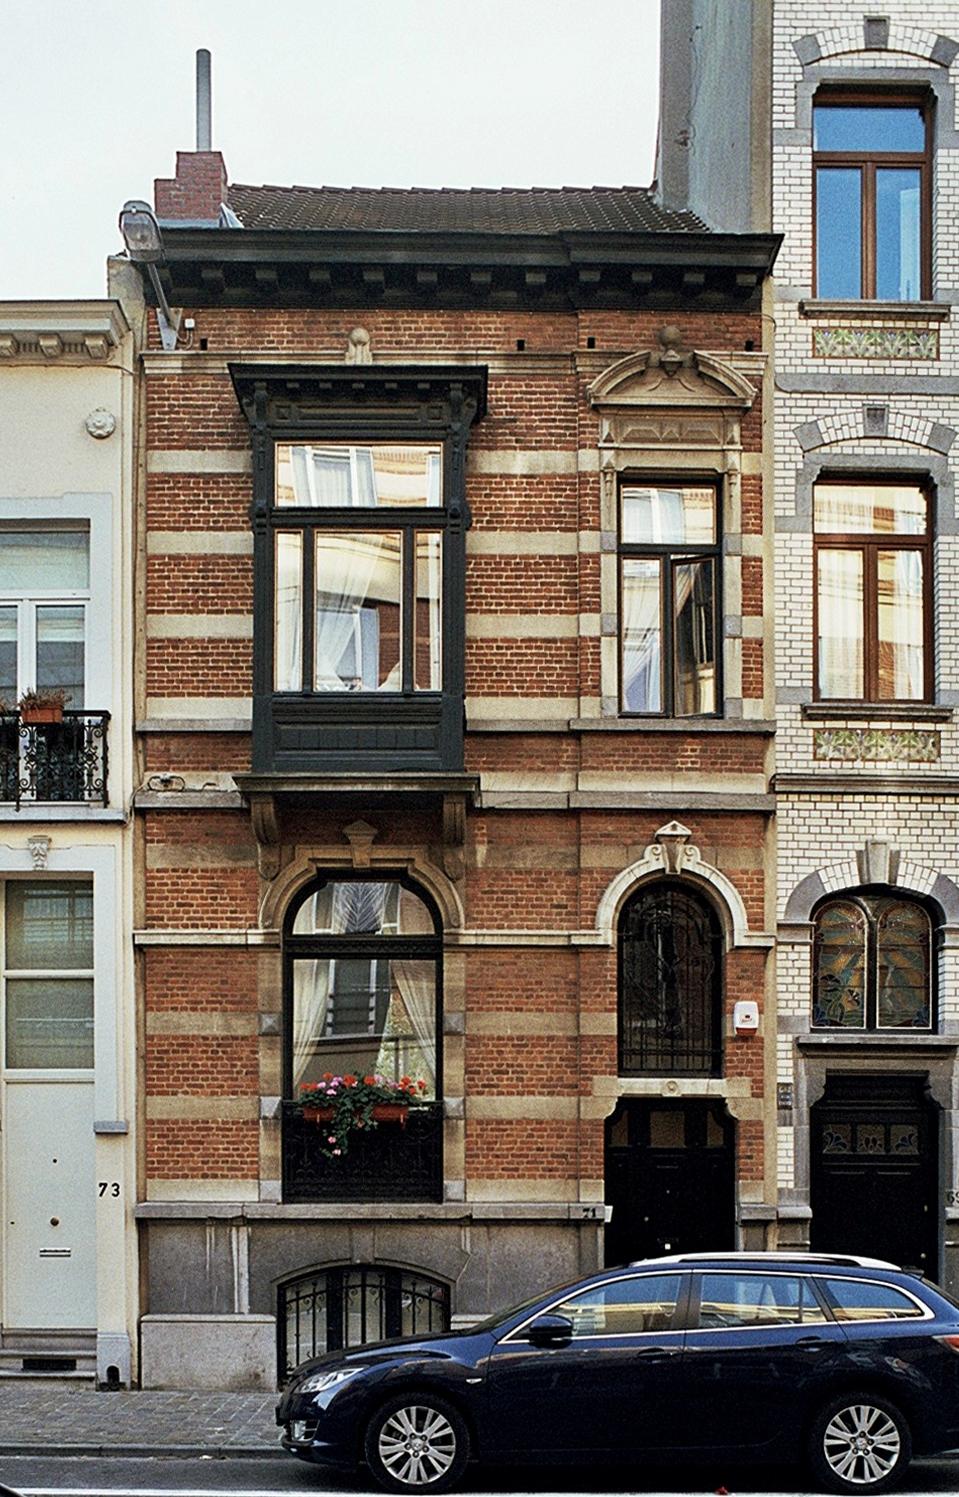 Rue Hobbema 71., 2009